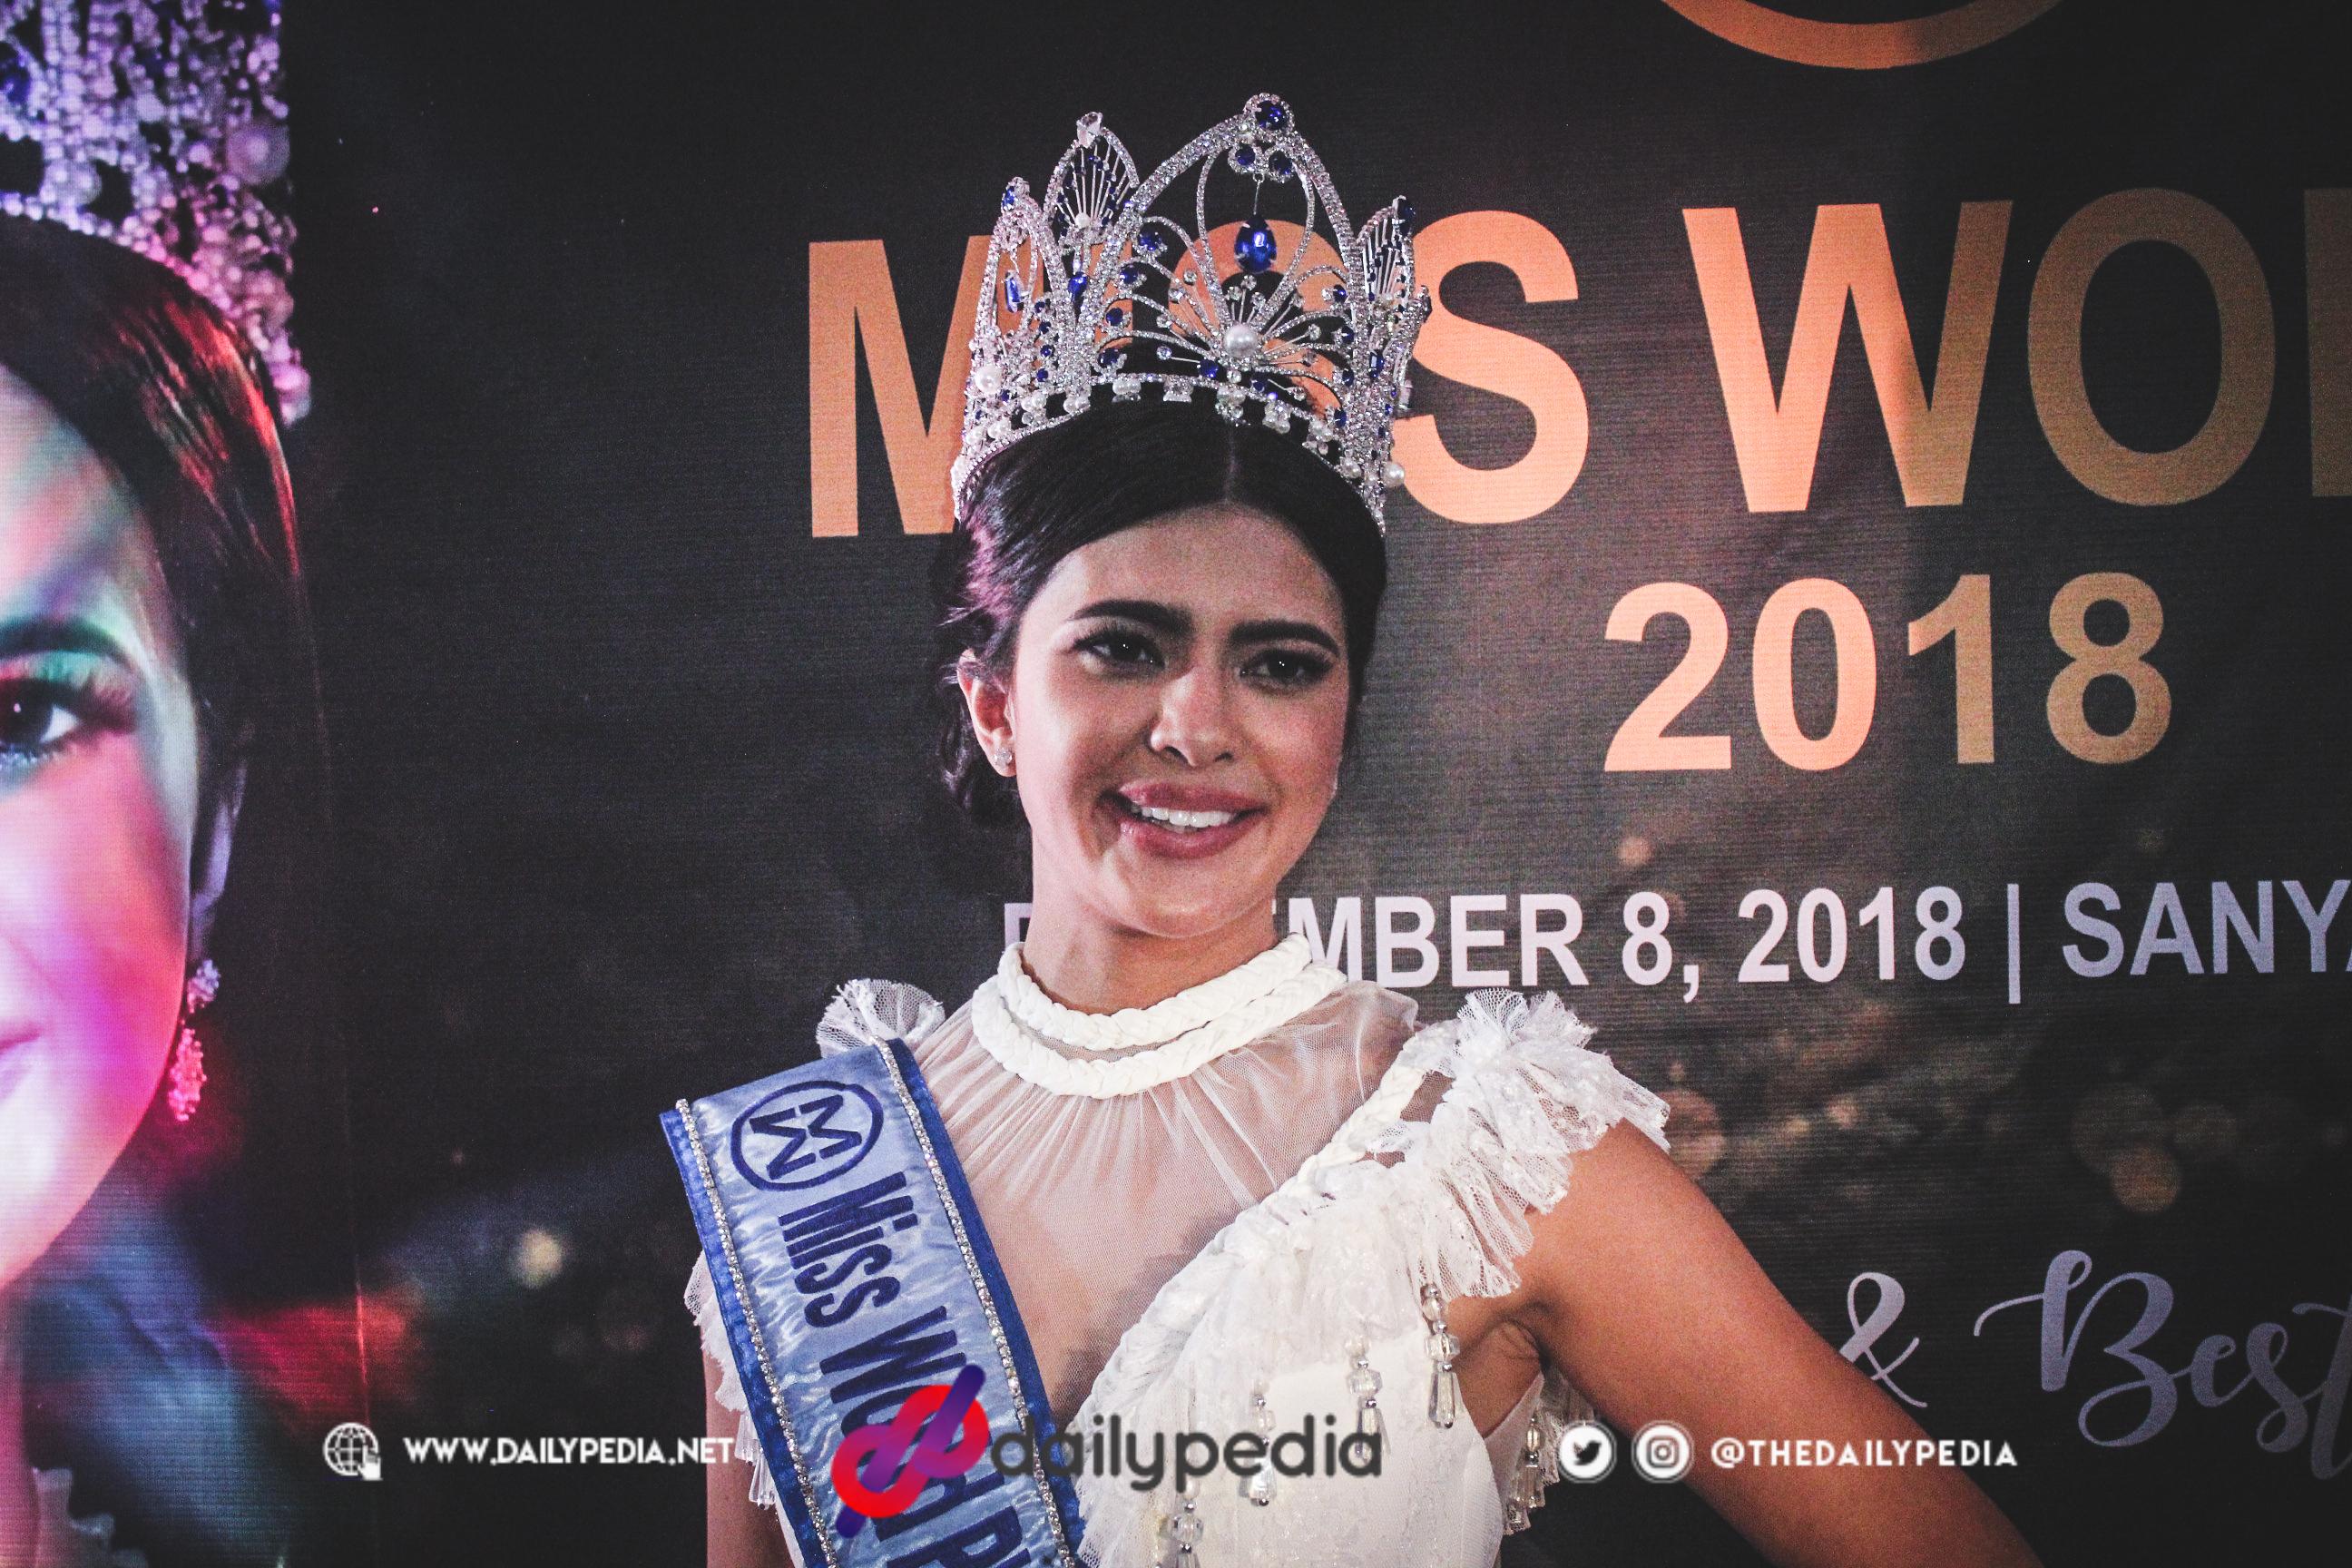 Image result for Miss World 2018 live pic logo